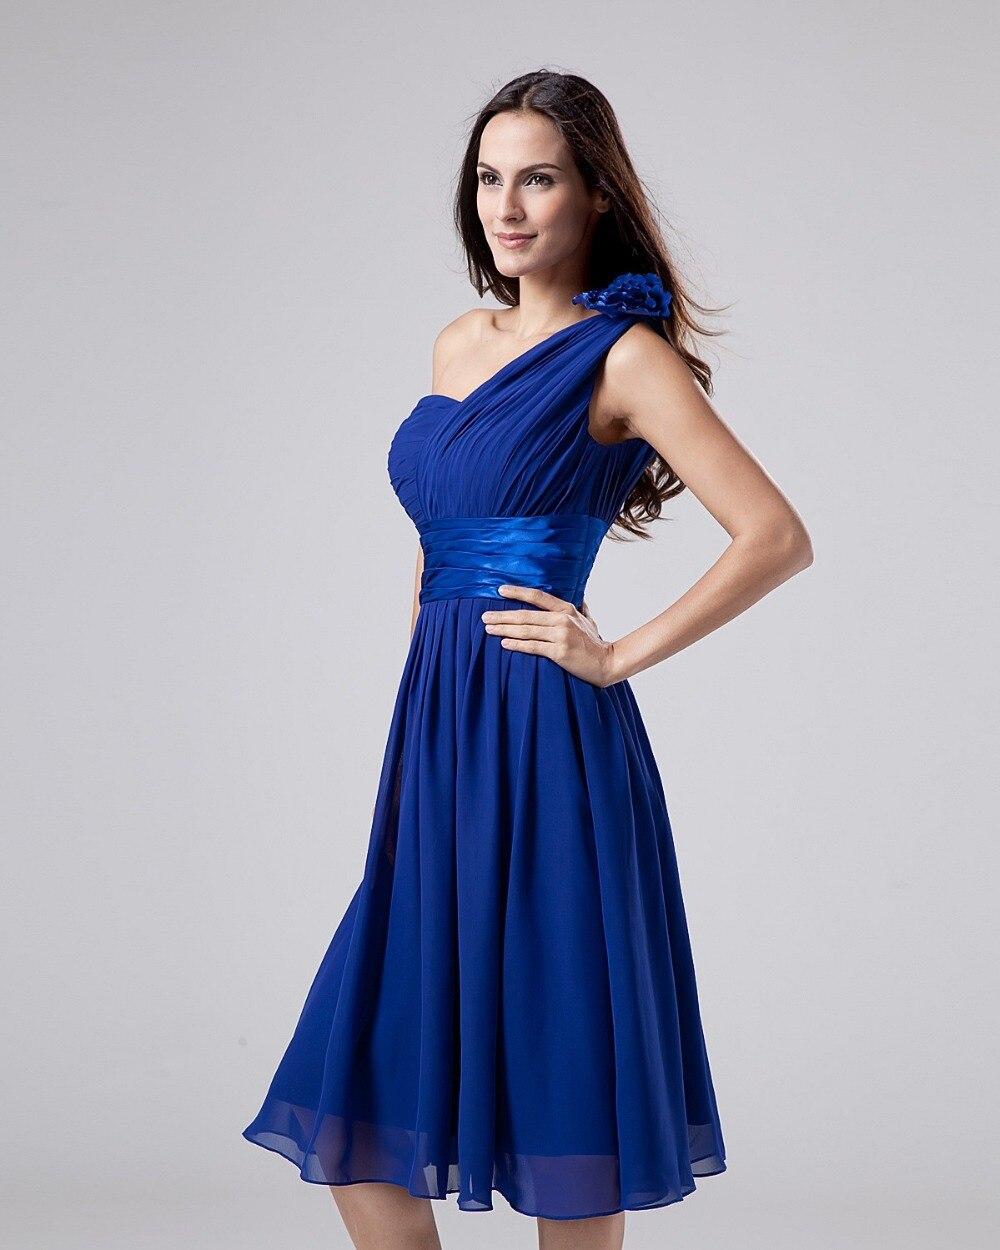 Simple blue bridesmaid dresses image collections braidsmaid simple blue bridesmaid dresses dress images simple blue bridesmaid dresses ombrellifo image collections ombrellifo Images